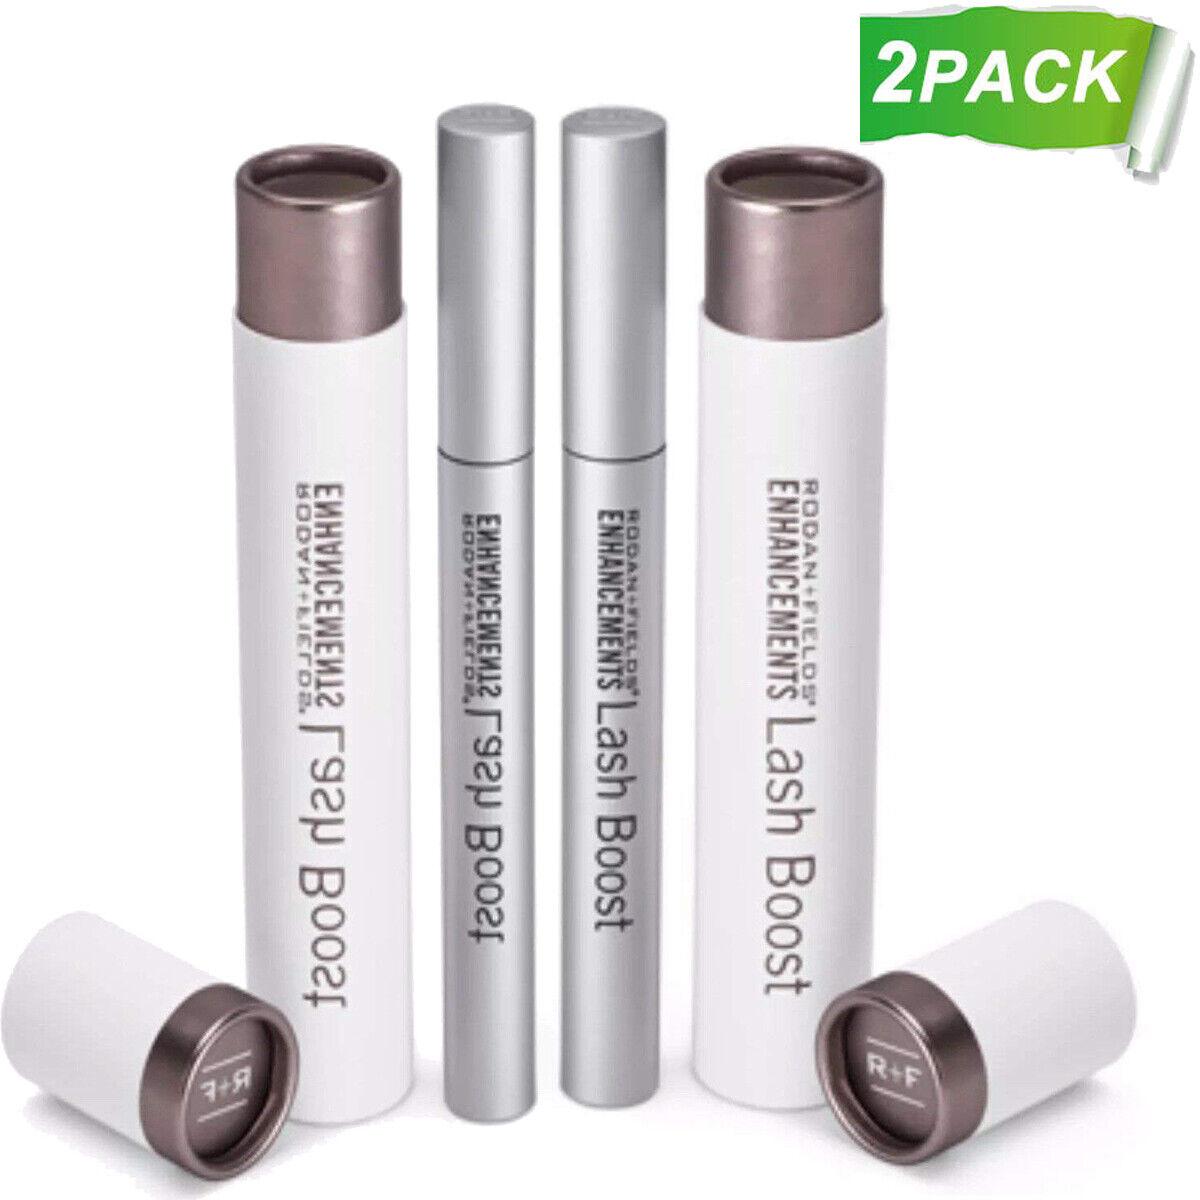 SEALED Rodan & and Fields Enhancements Lash Boost Eyelash Serum(5 ml/USA) 2 PACK 2